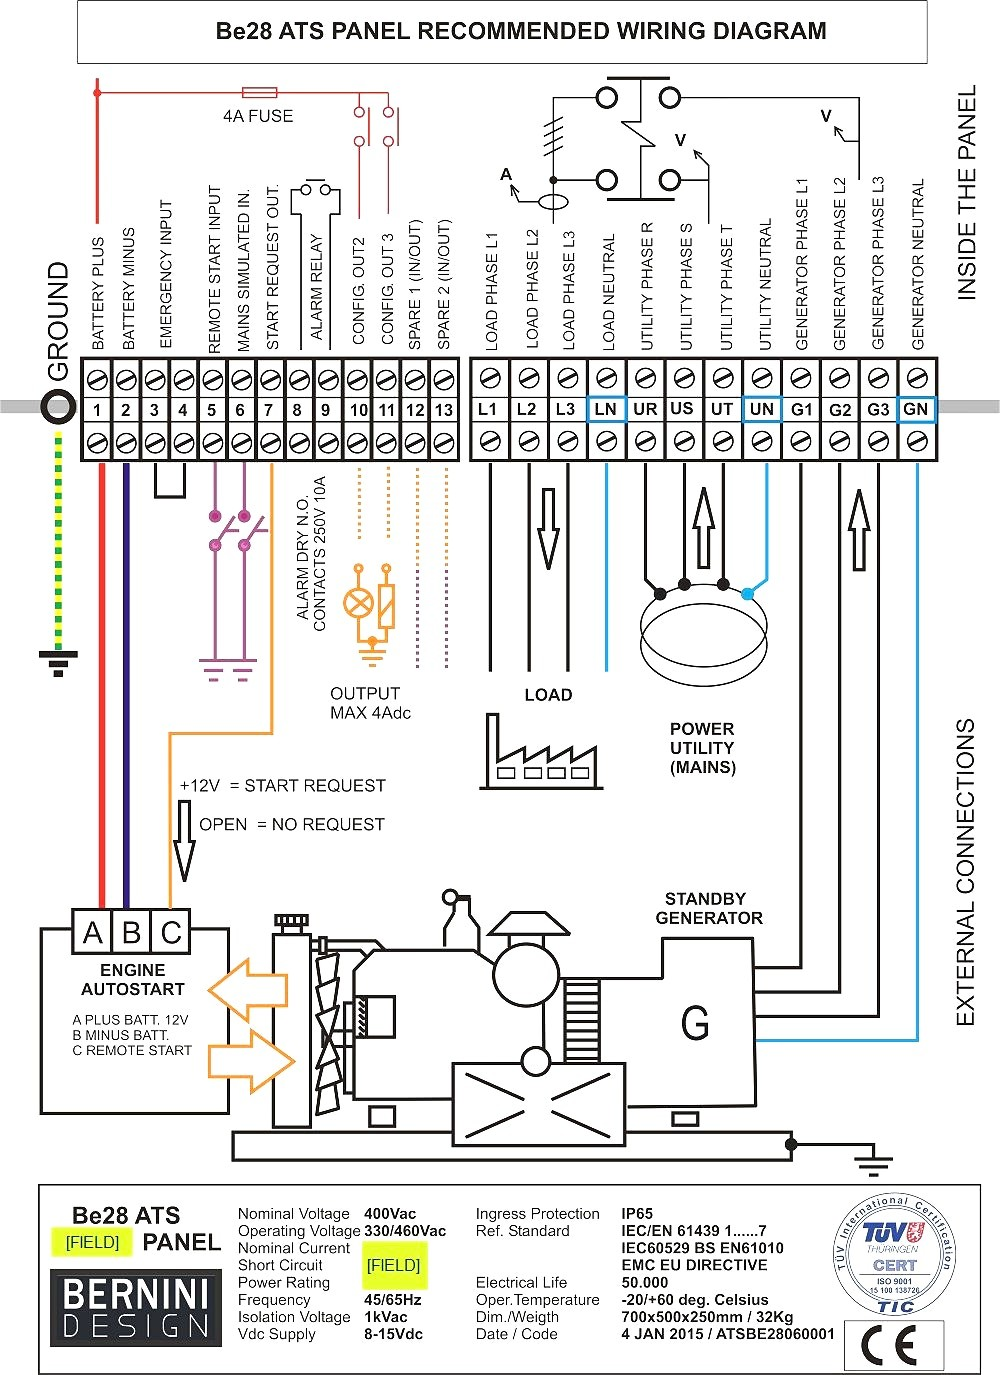 Wiring Diagram Generac Generator For Rvs Wiring Center \u2022 Generac  Transfer Switch Installation Generac Generator Wiring Diagram Model 0059430